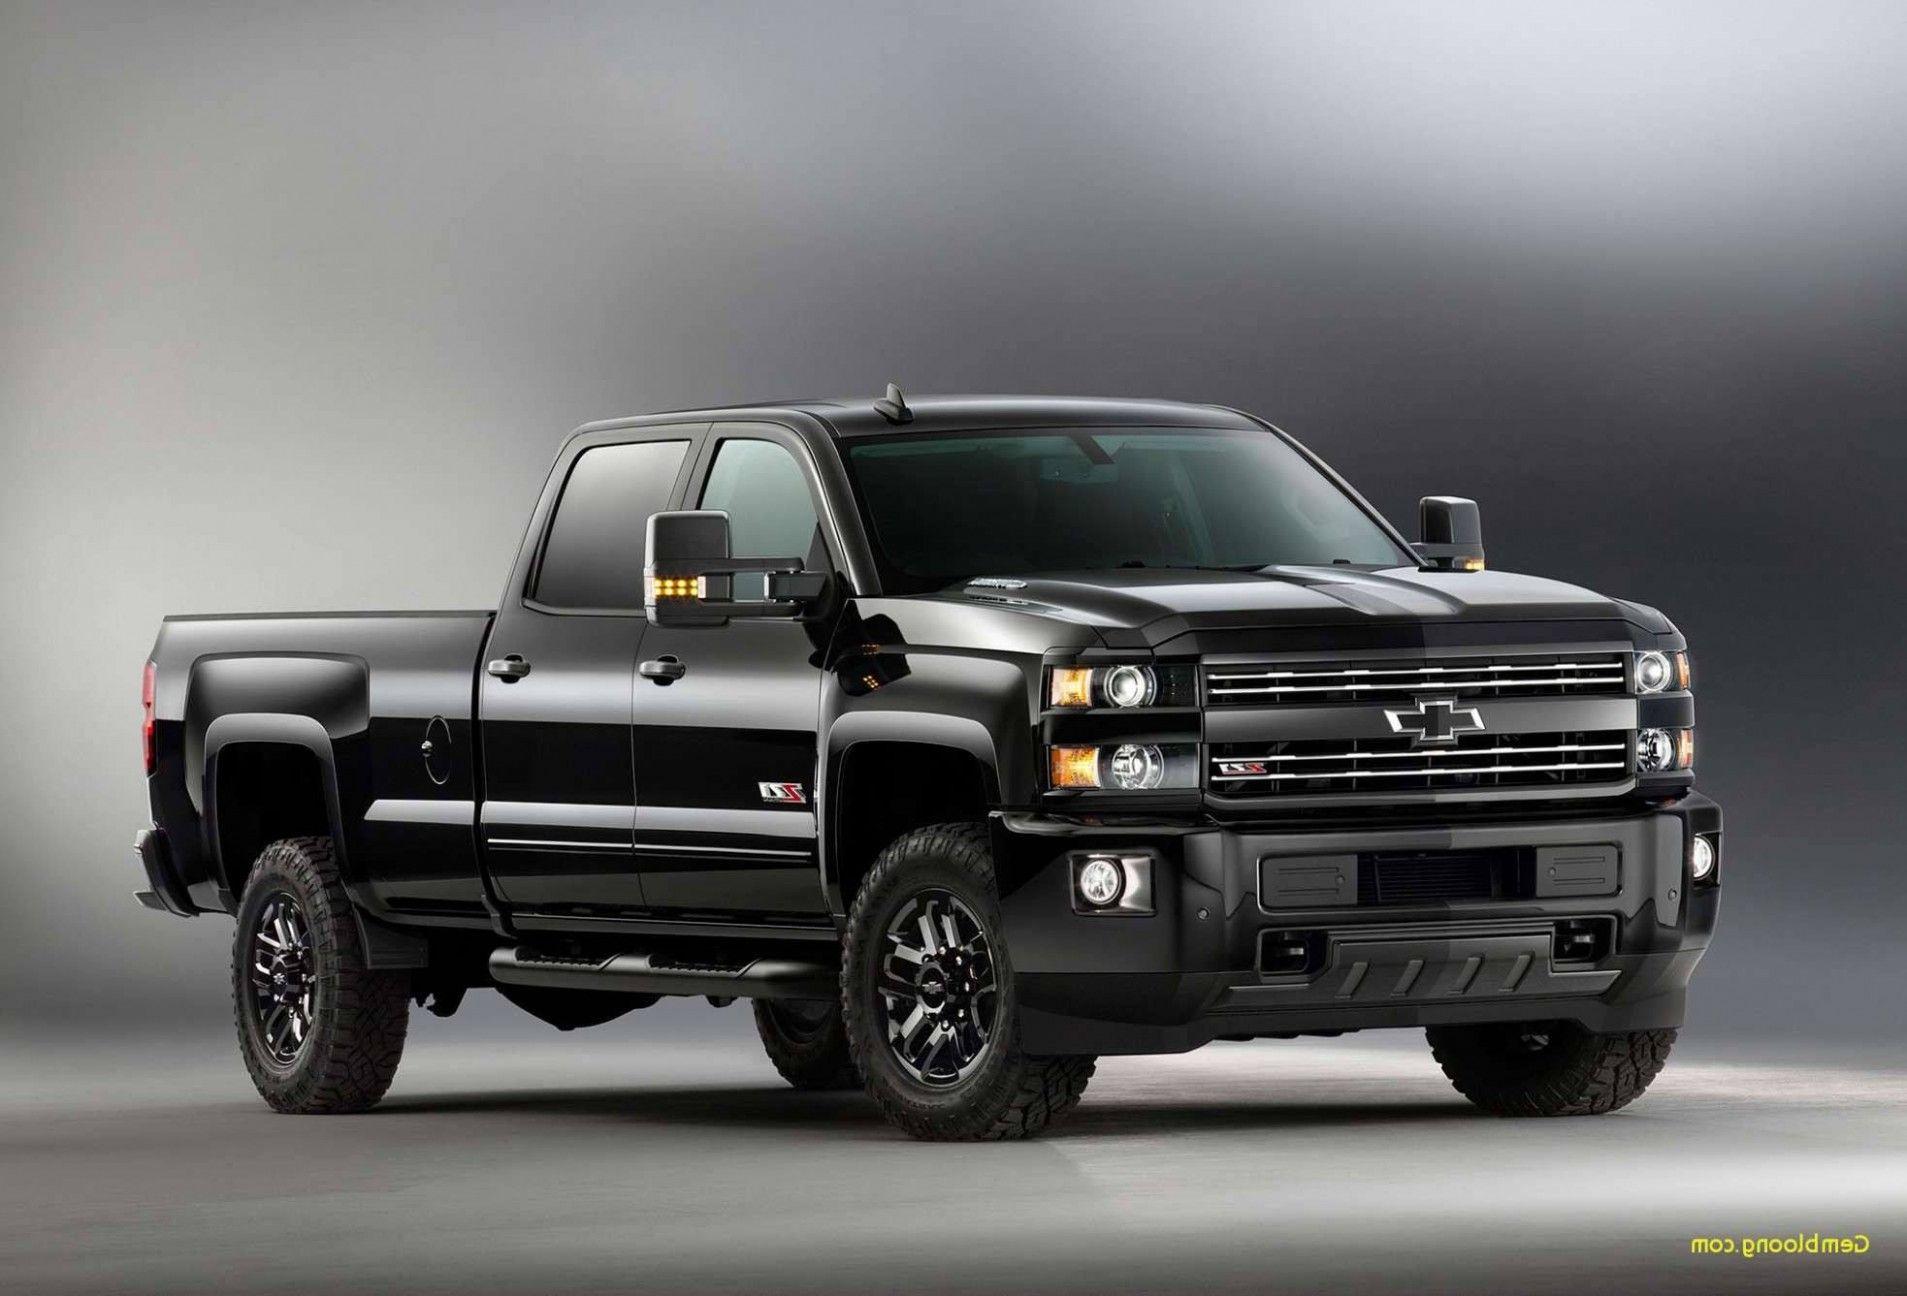 2020 Chevrolet Z71 Truck Price 2020 Chevrolet Z71 Truck Earlier